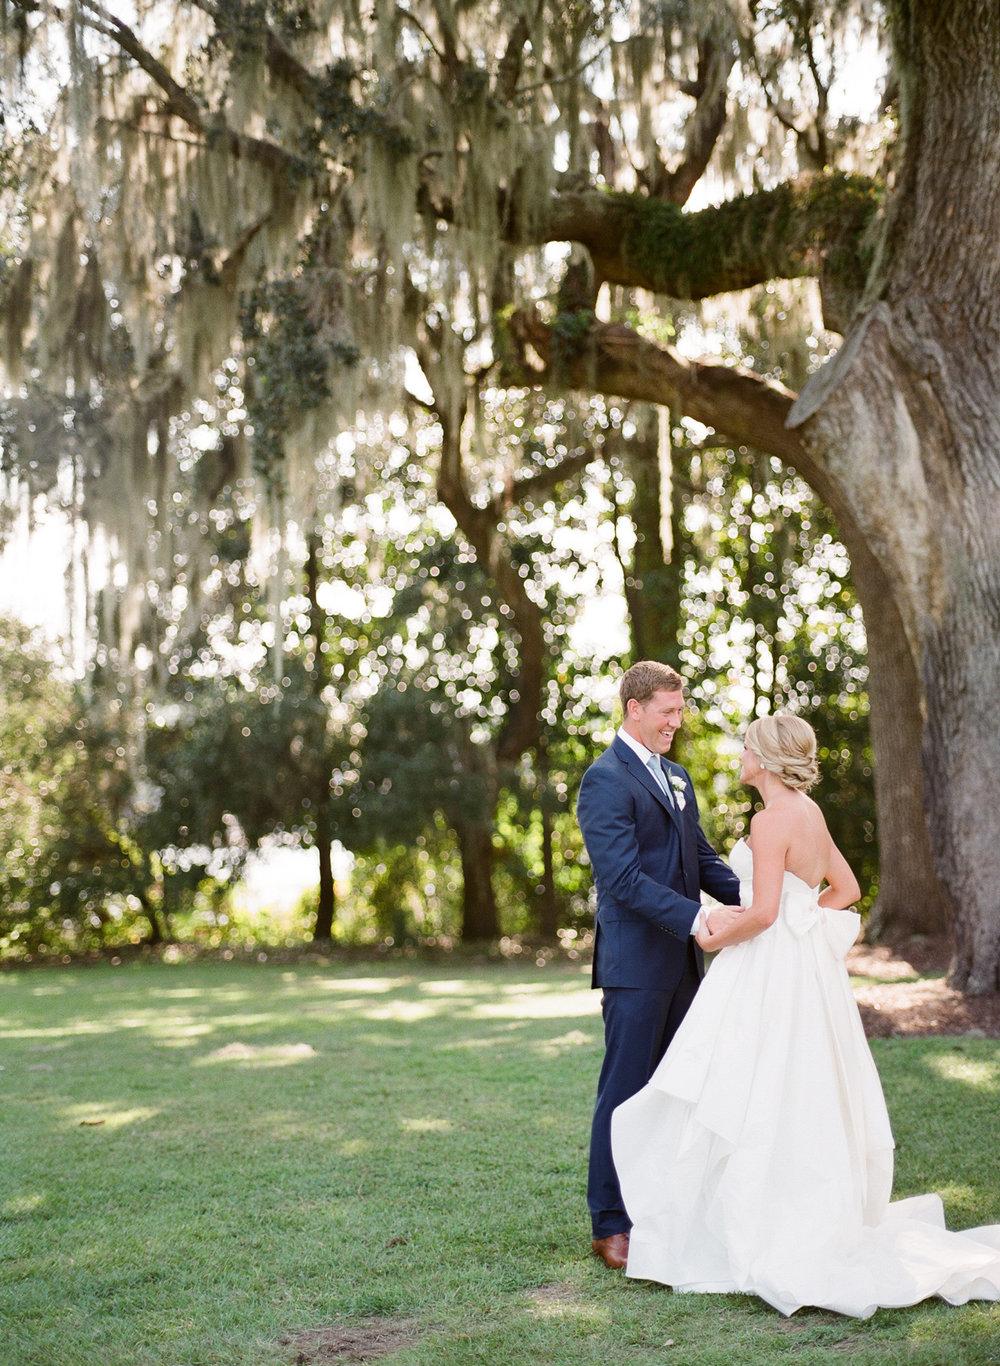 Airlie-Gardens-Wedding-24.jpg